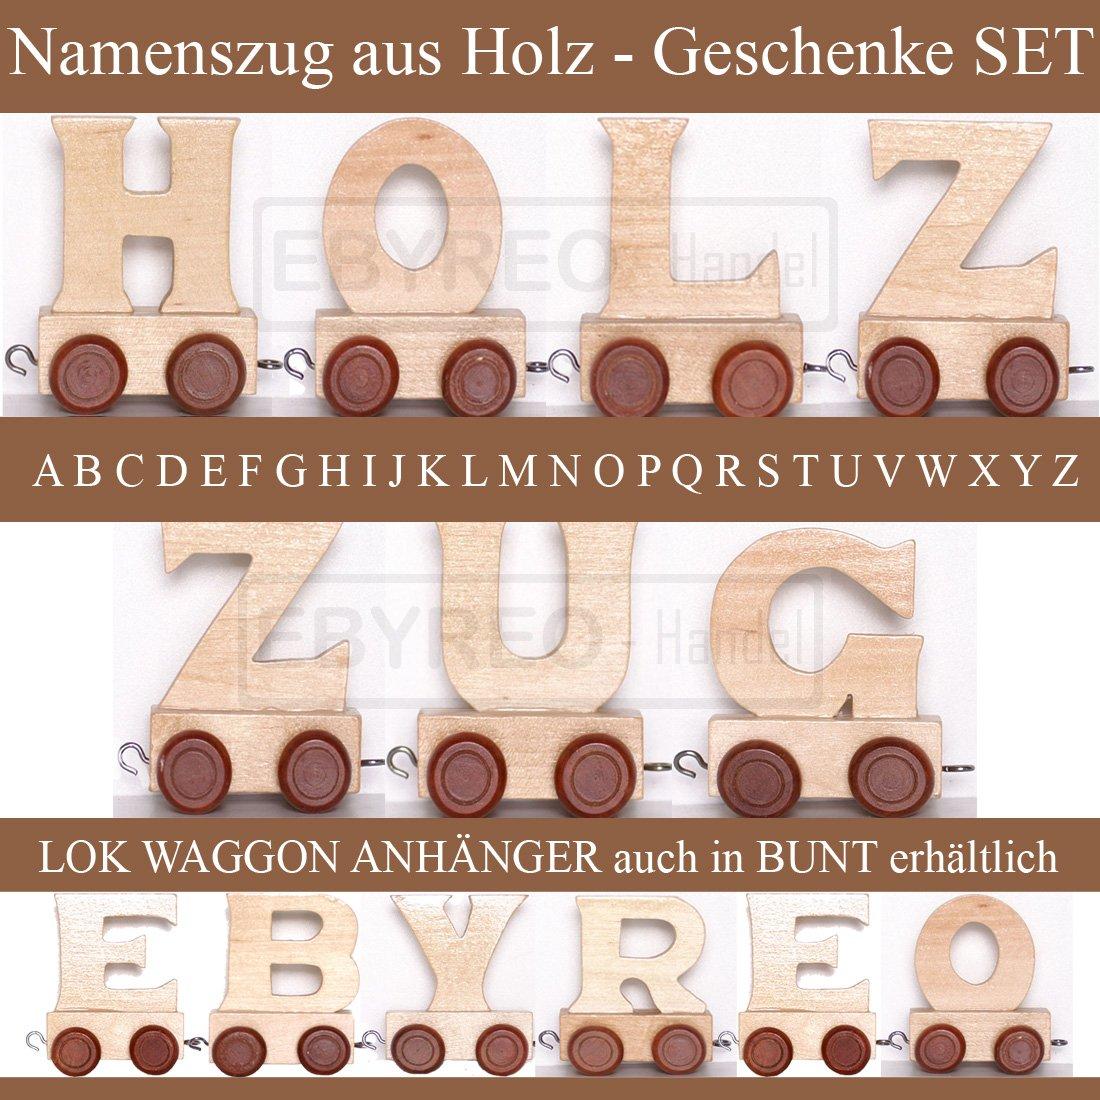 Taufgeschenk Geschenk zu Einschulung Buchstabenzug Namens-Set Lok Geschenk zur Geburt Alper personalisierbar Endwaggon Alper EbyReo/® Namenszug aus Holz